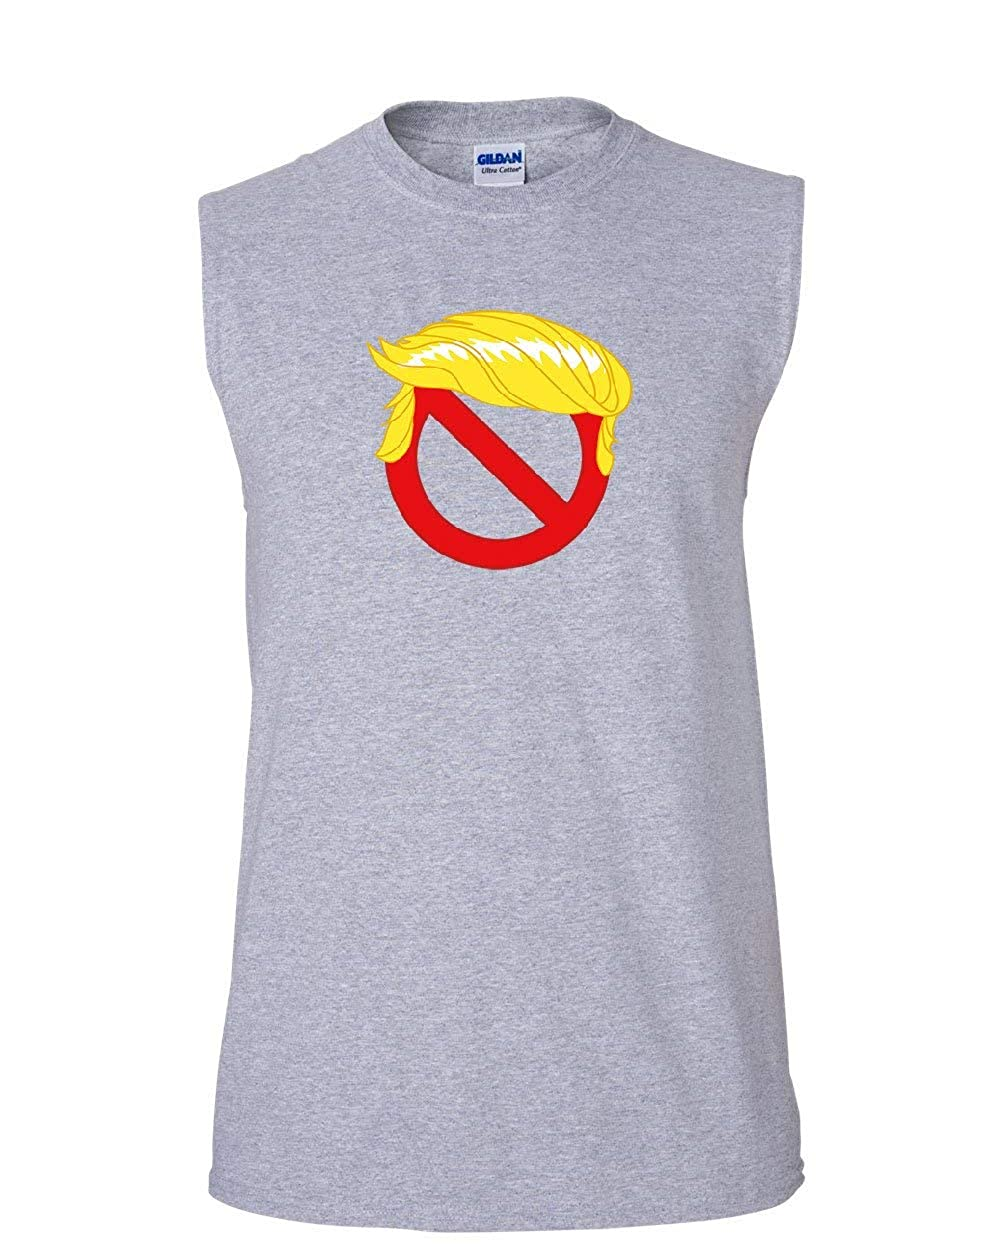 No Trump Muscle Shirt Anti Trump Resist Impeachment Resign Dump Stop Sleeveless